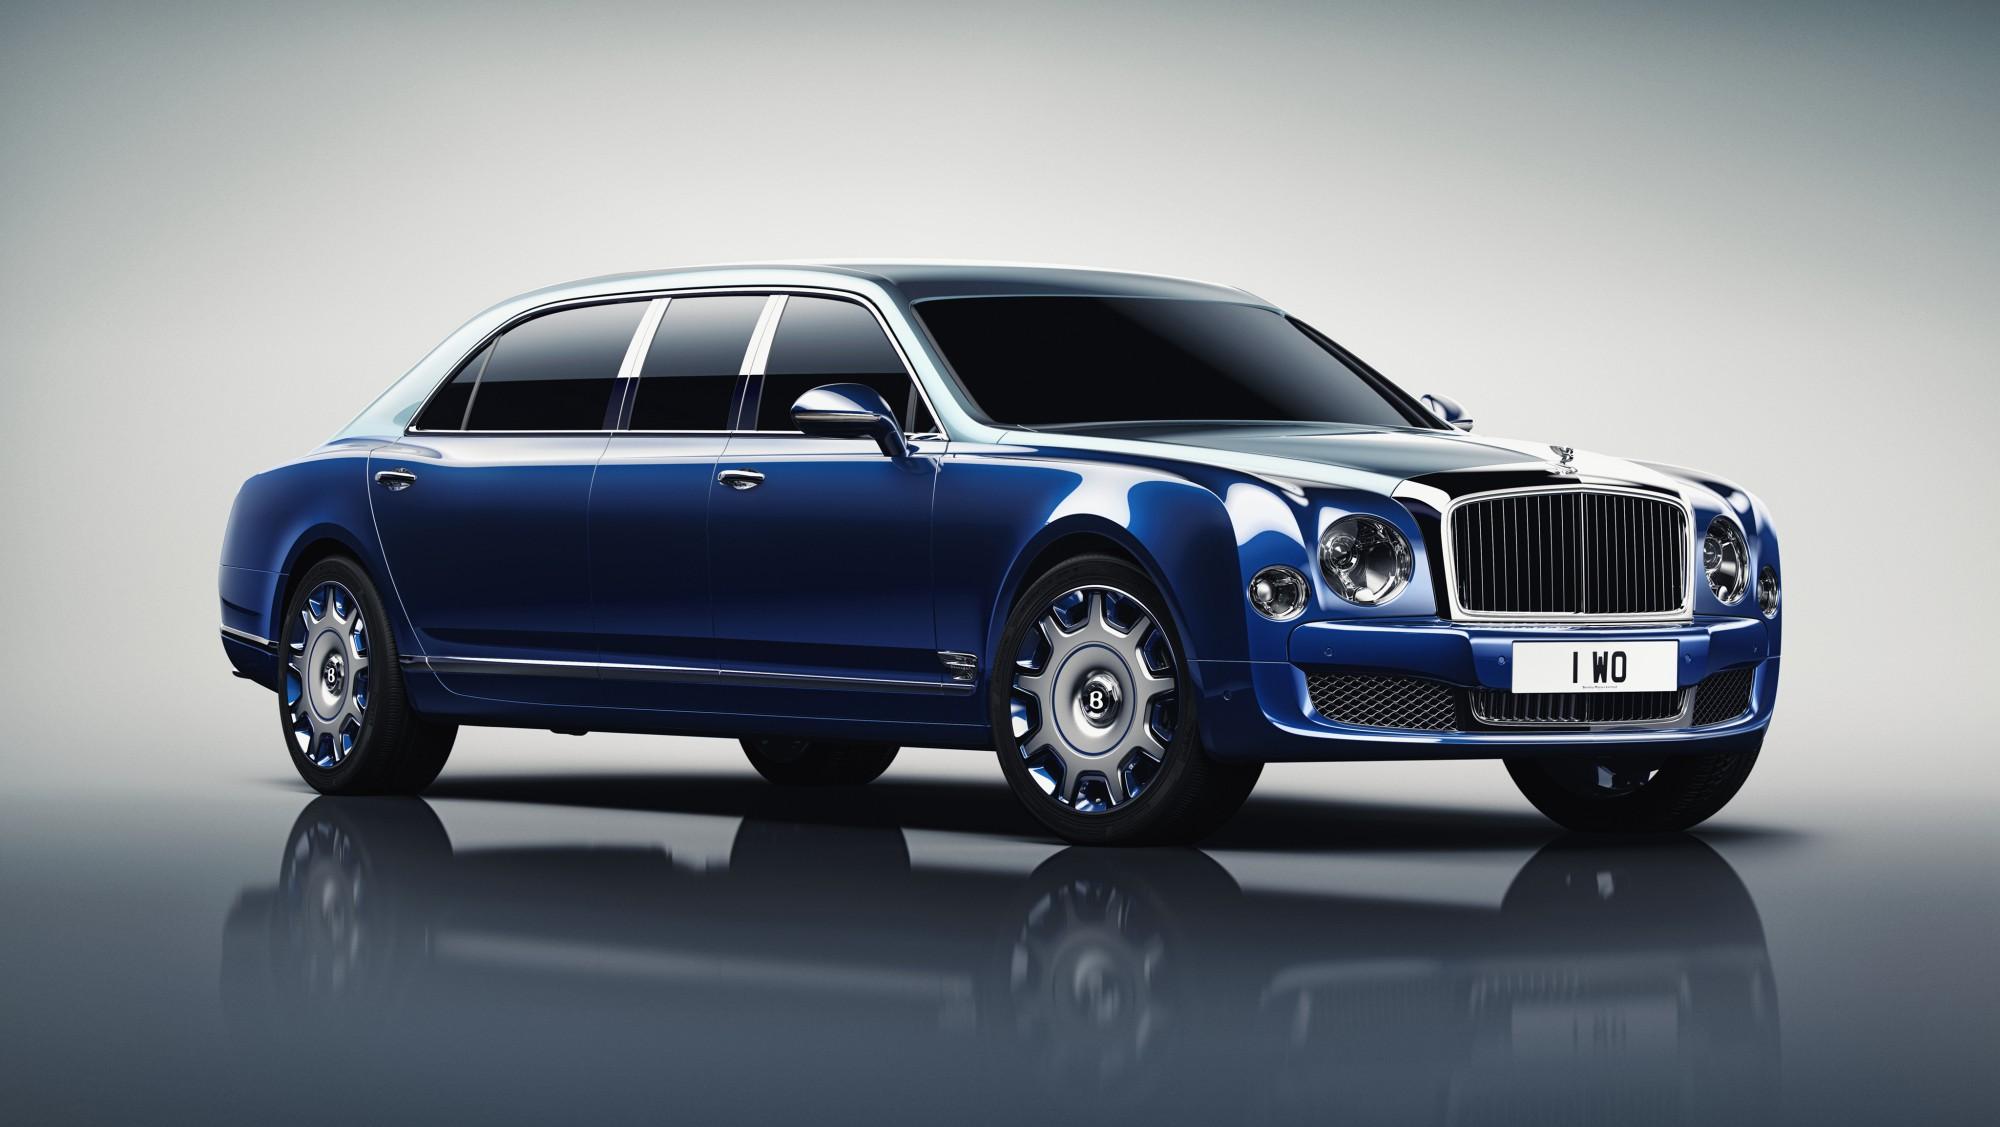 bentley_mulsanne_grand_limousine_by_mulliner_3